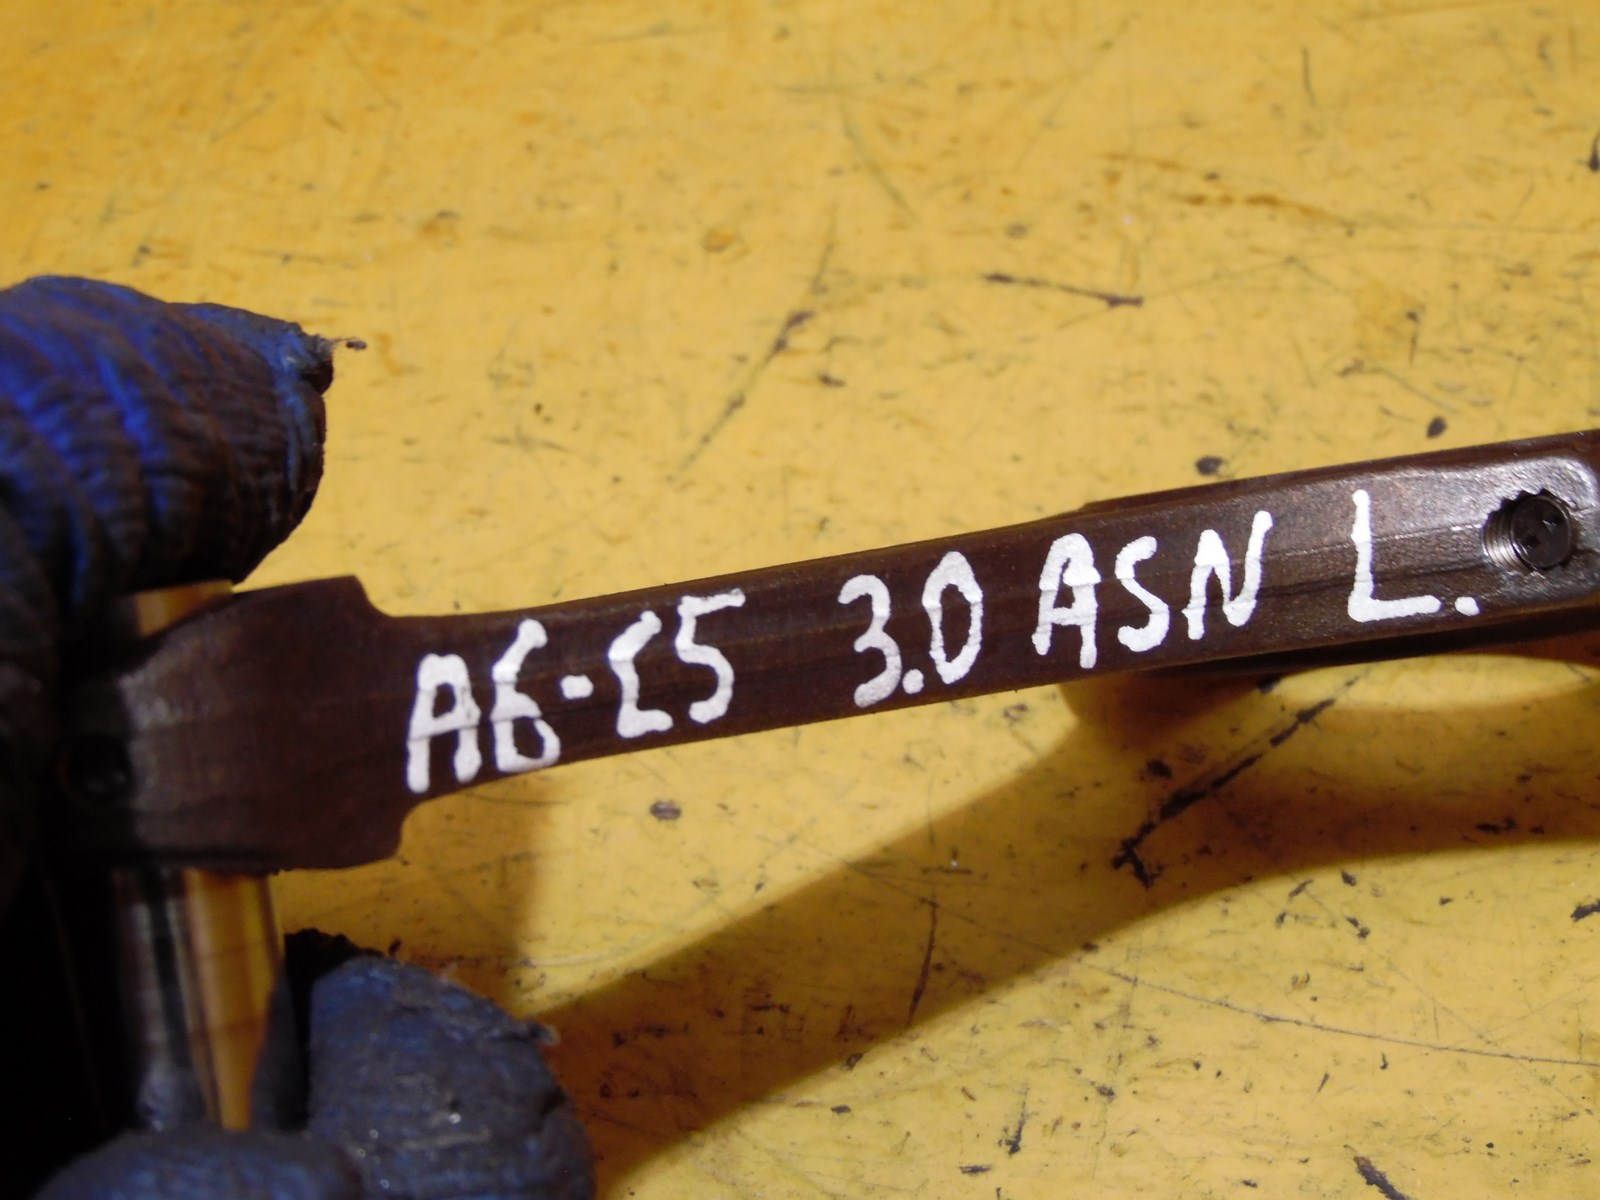 КРИВОШИПНО ШАТУН A4 A6 A8 3.0 ASN 220 КМ